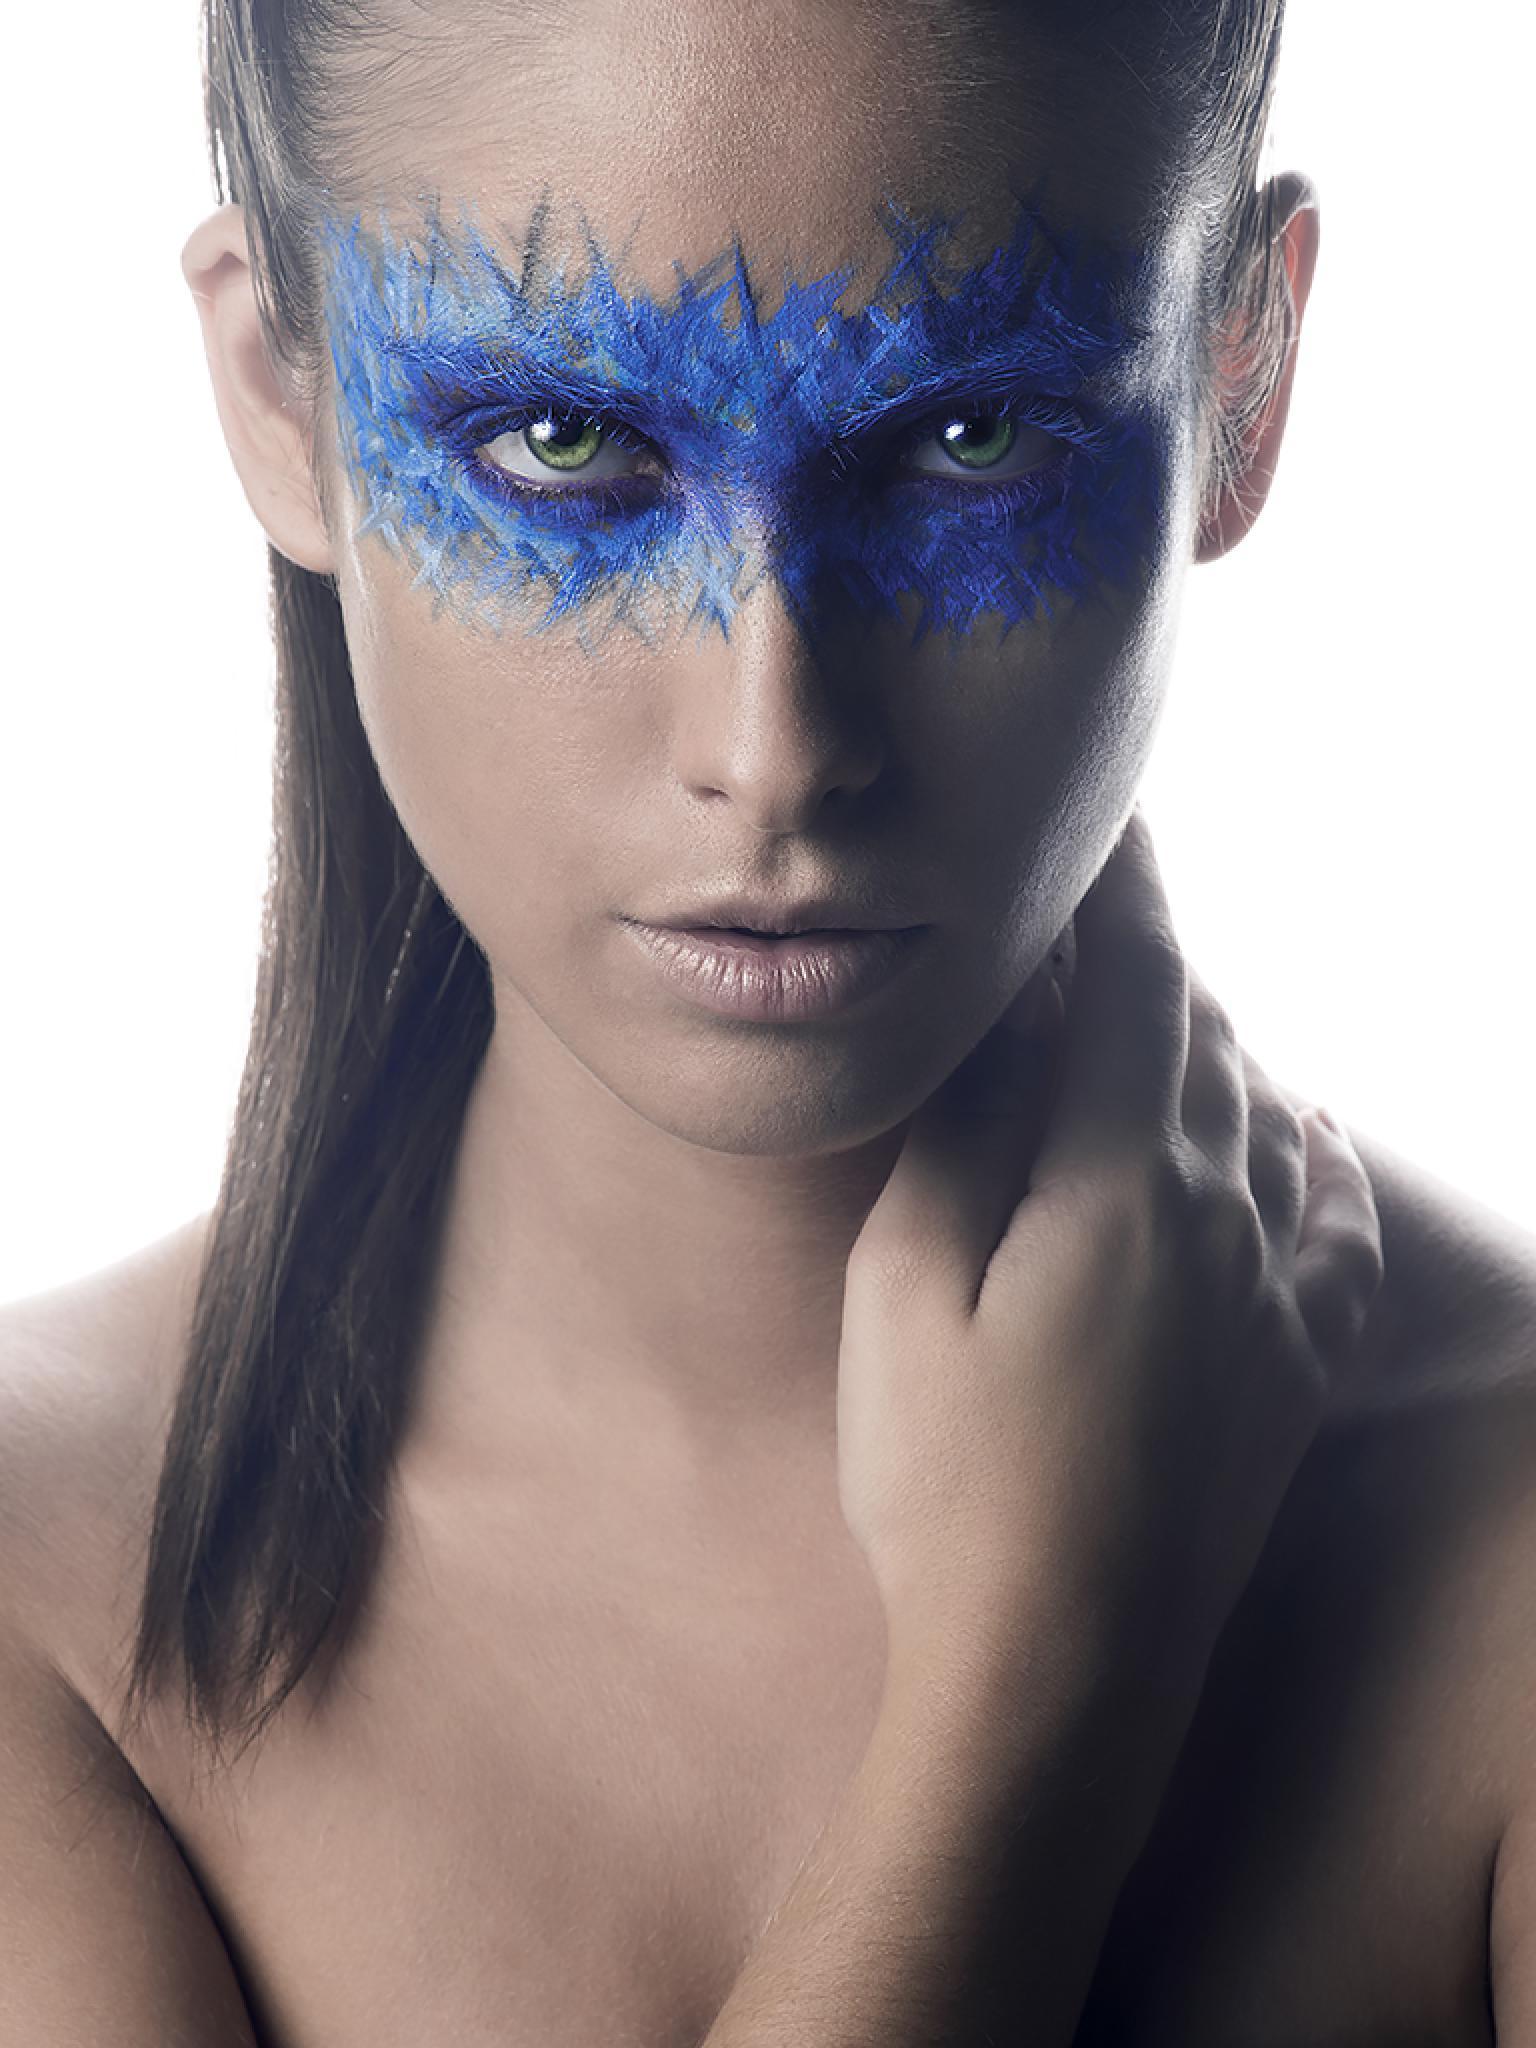 Photo in Portrait #anna mompó #anna #ana #mompo #woman #girl #sexy #beauty #beautiful #beauty portrait #portrait #make up #makeup #retouch #portraiture #spain #españa #alicante #guardamar #jmvaliente #photoshoot #studio #photostudio #photo studio #bowens